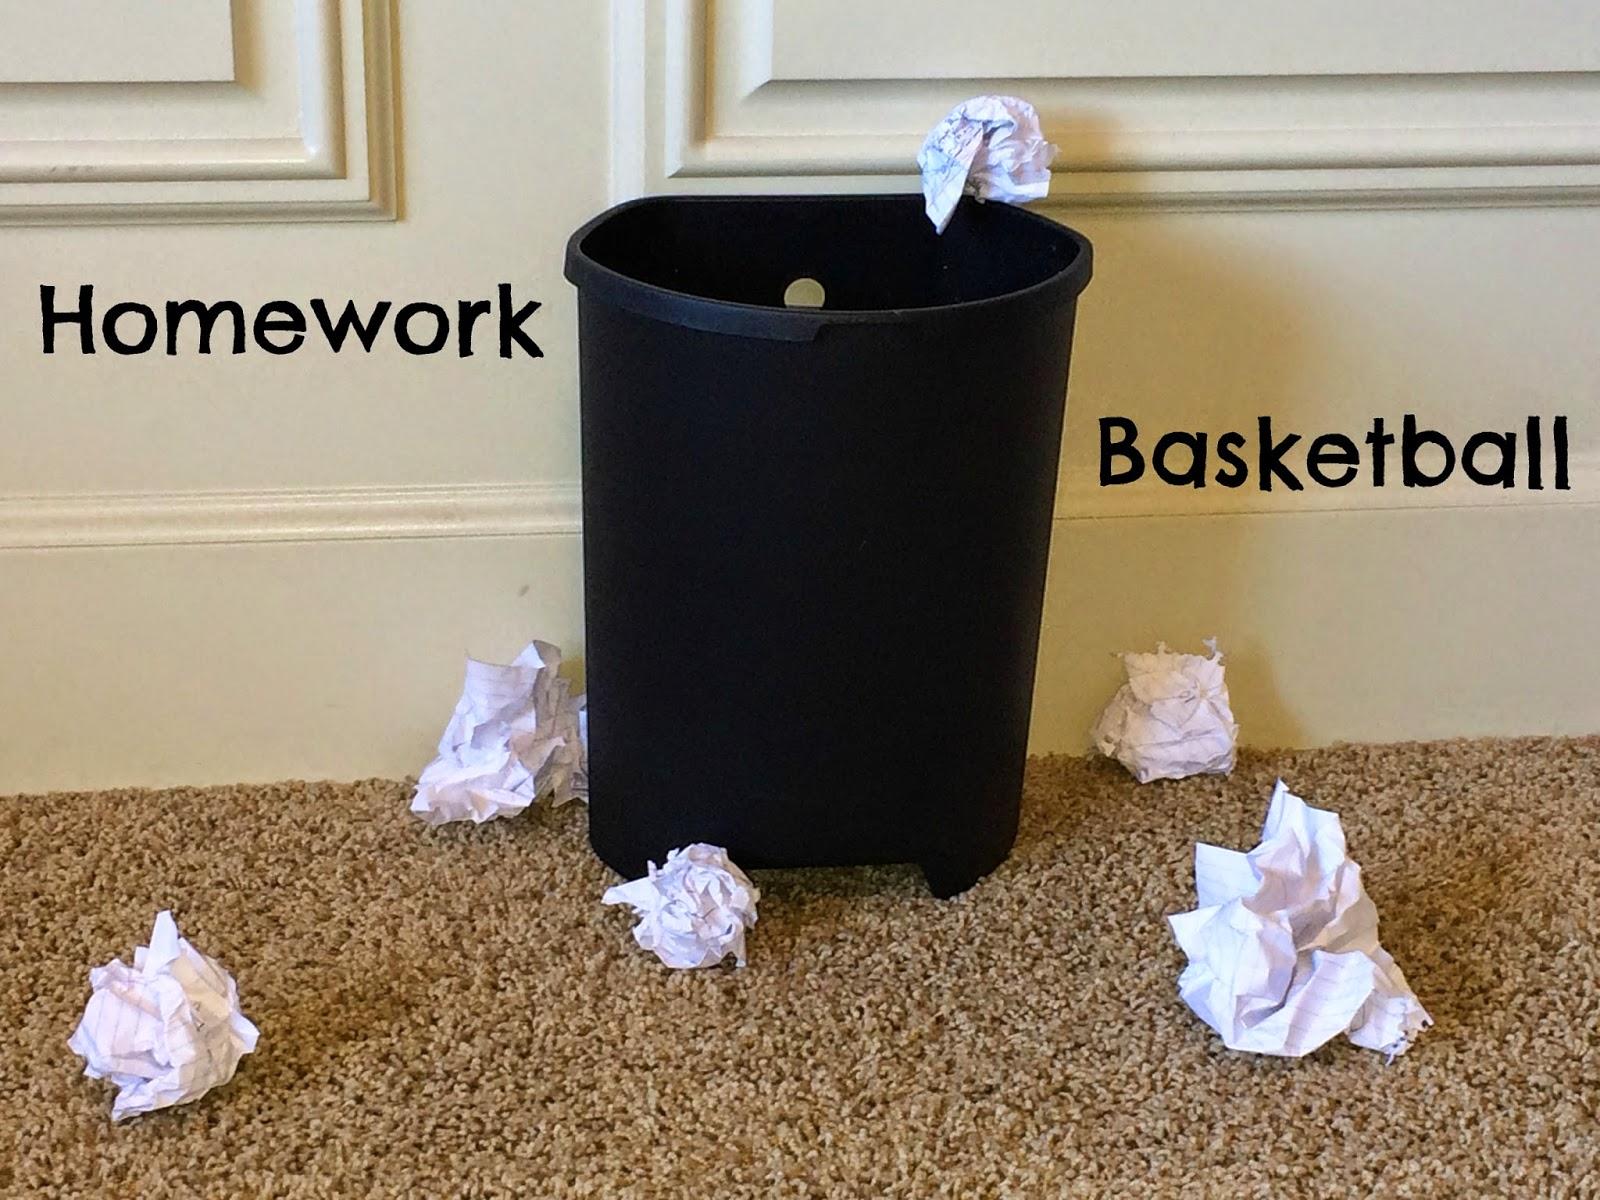 homework basketball